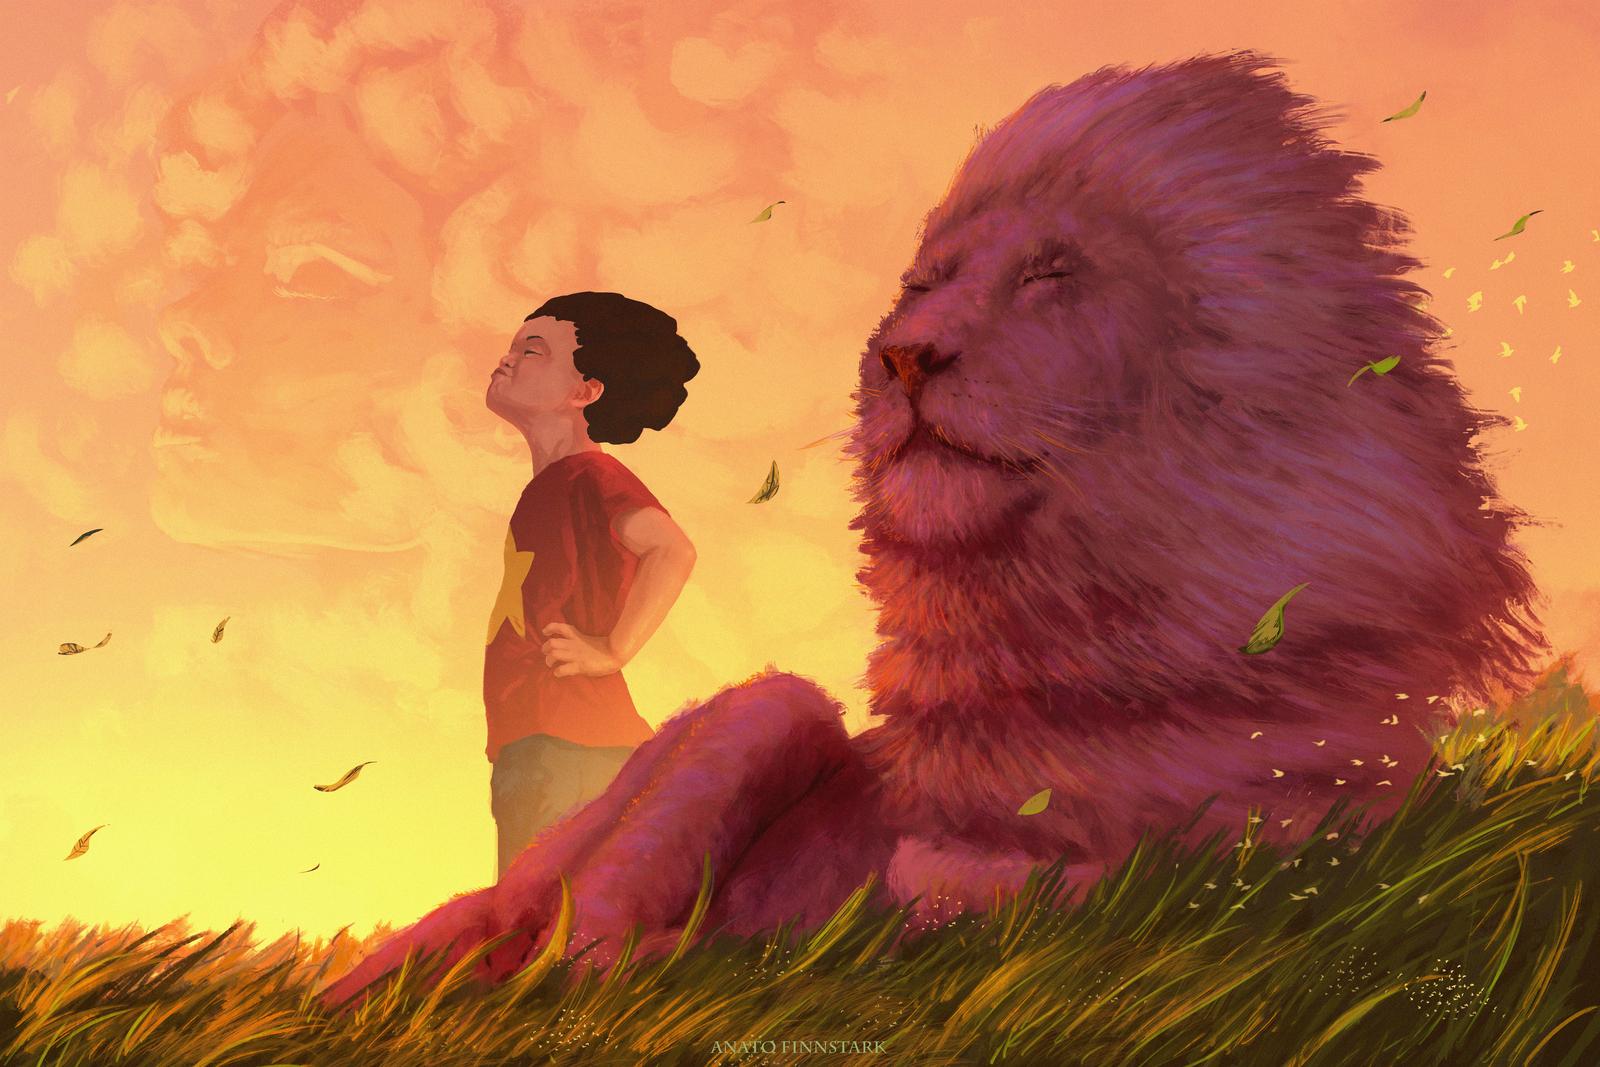 Feel Good ( Steven Universe ) by AnatoFinnstark